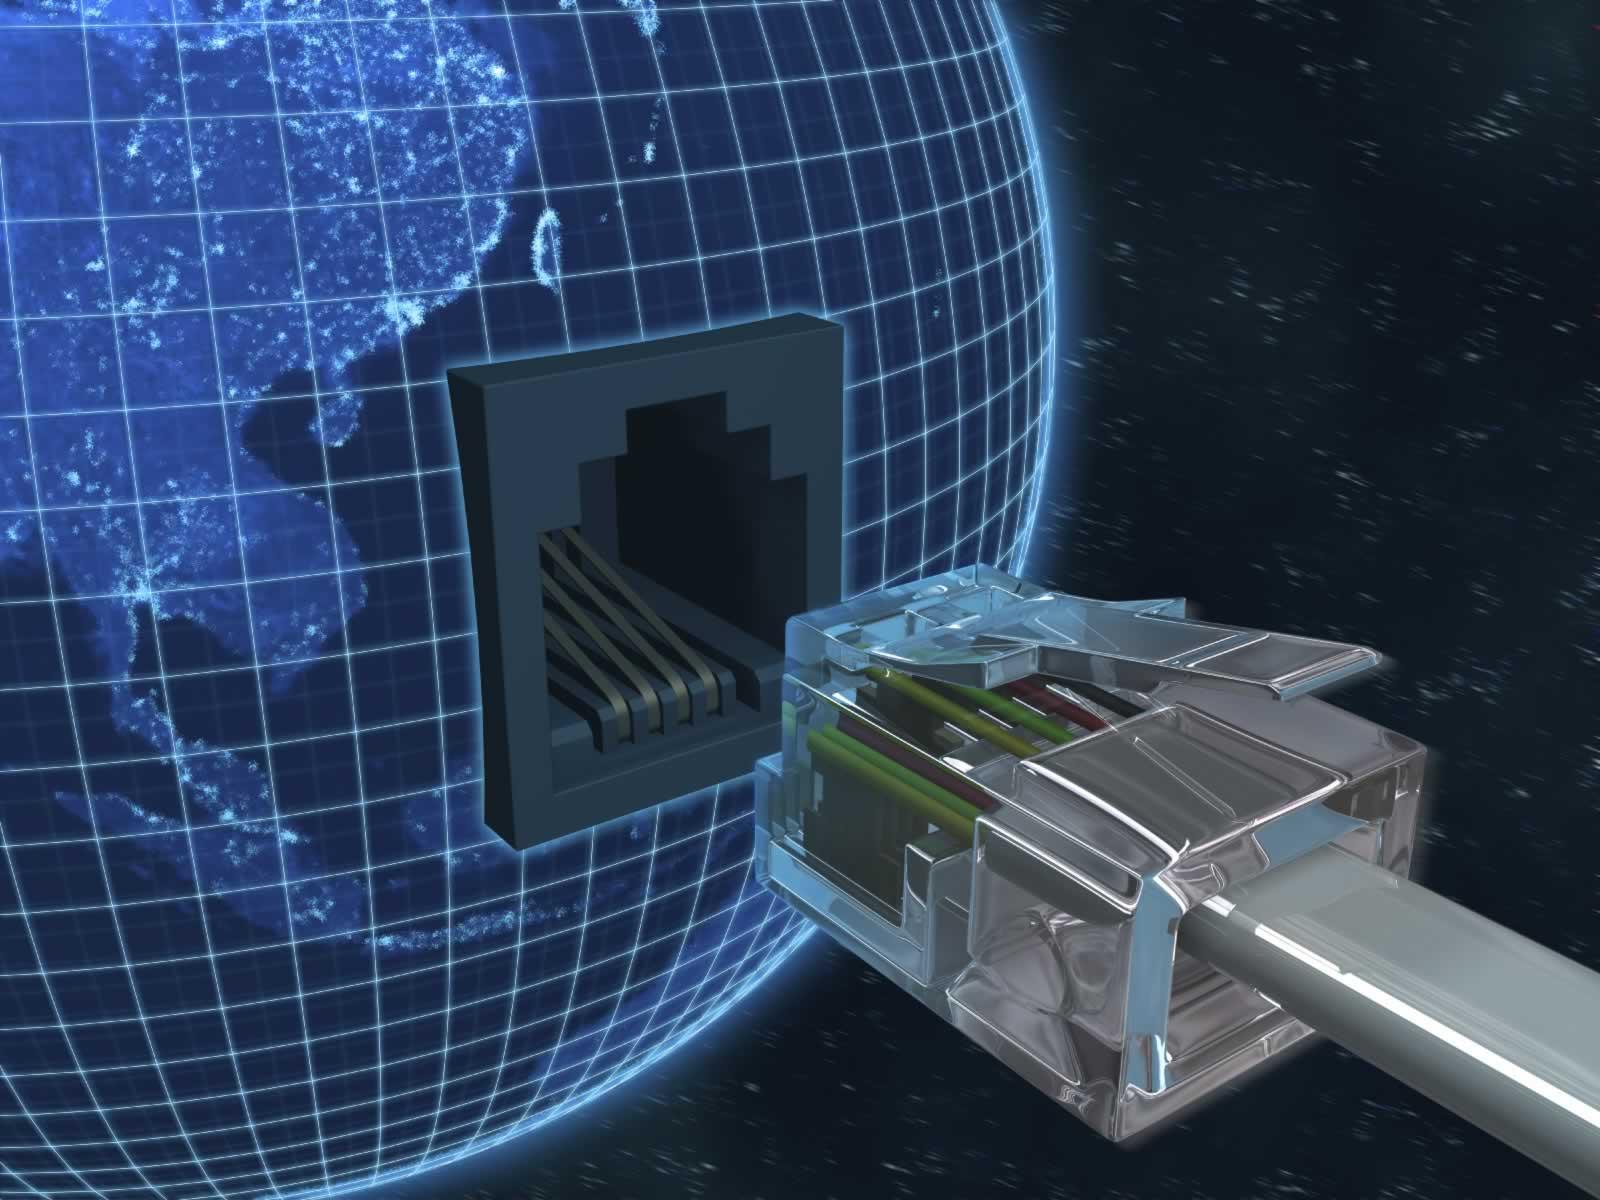 telecom isp internet service provider launch 3 telecom